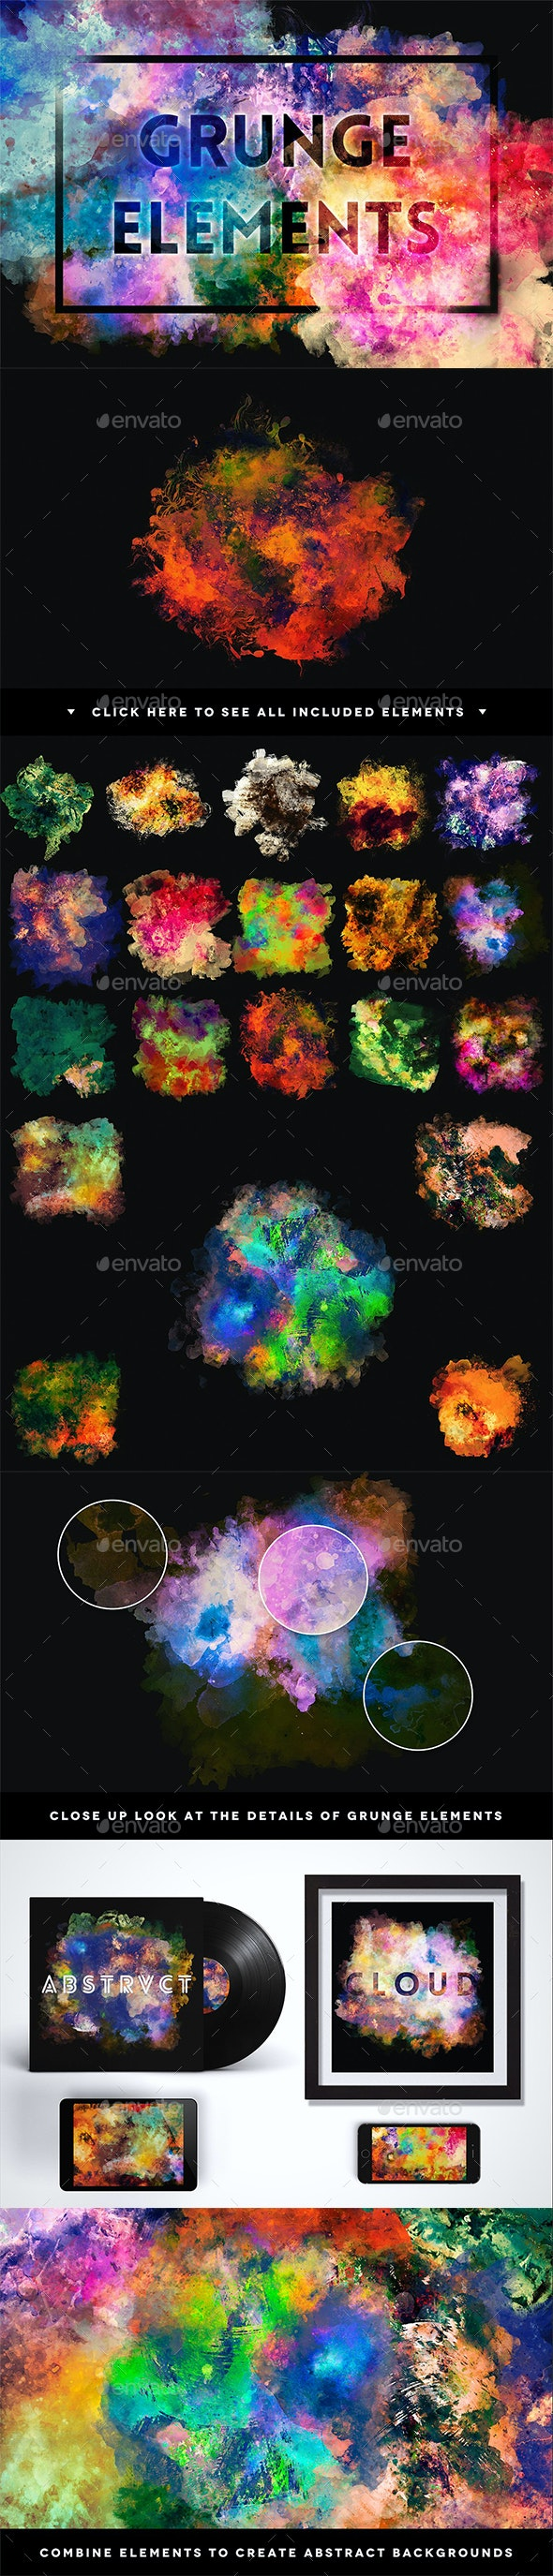 Grunge Elements Background Creation Kit - Backgrounds Graphics